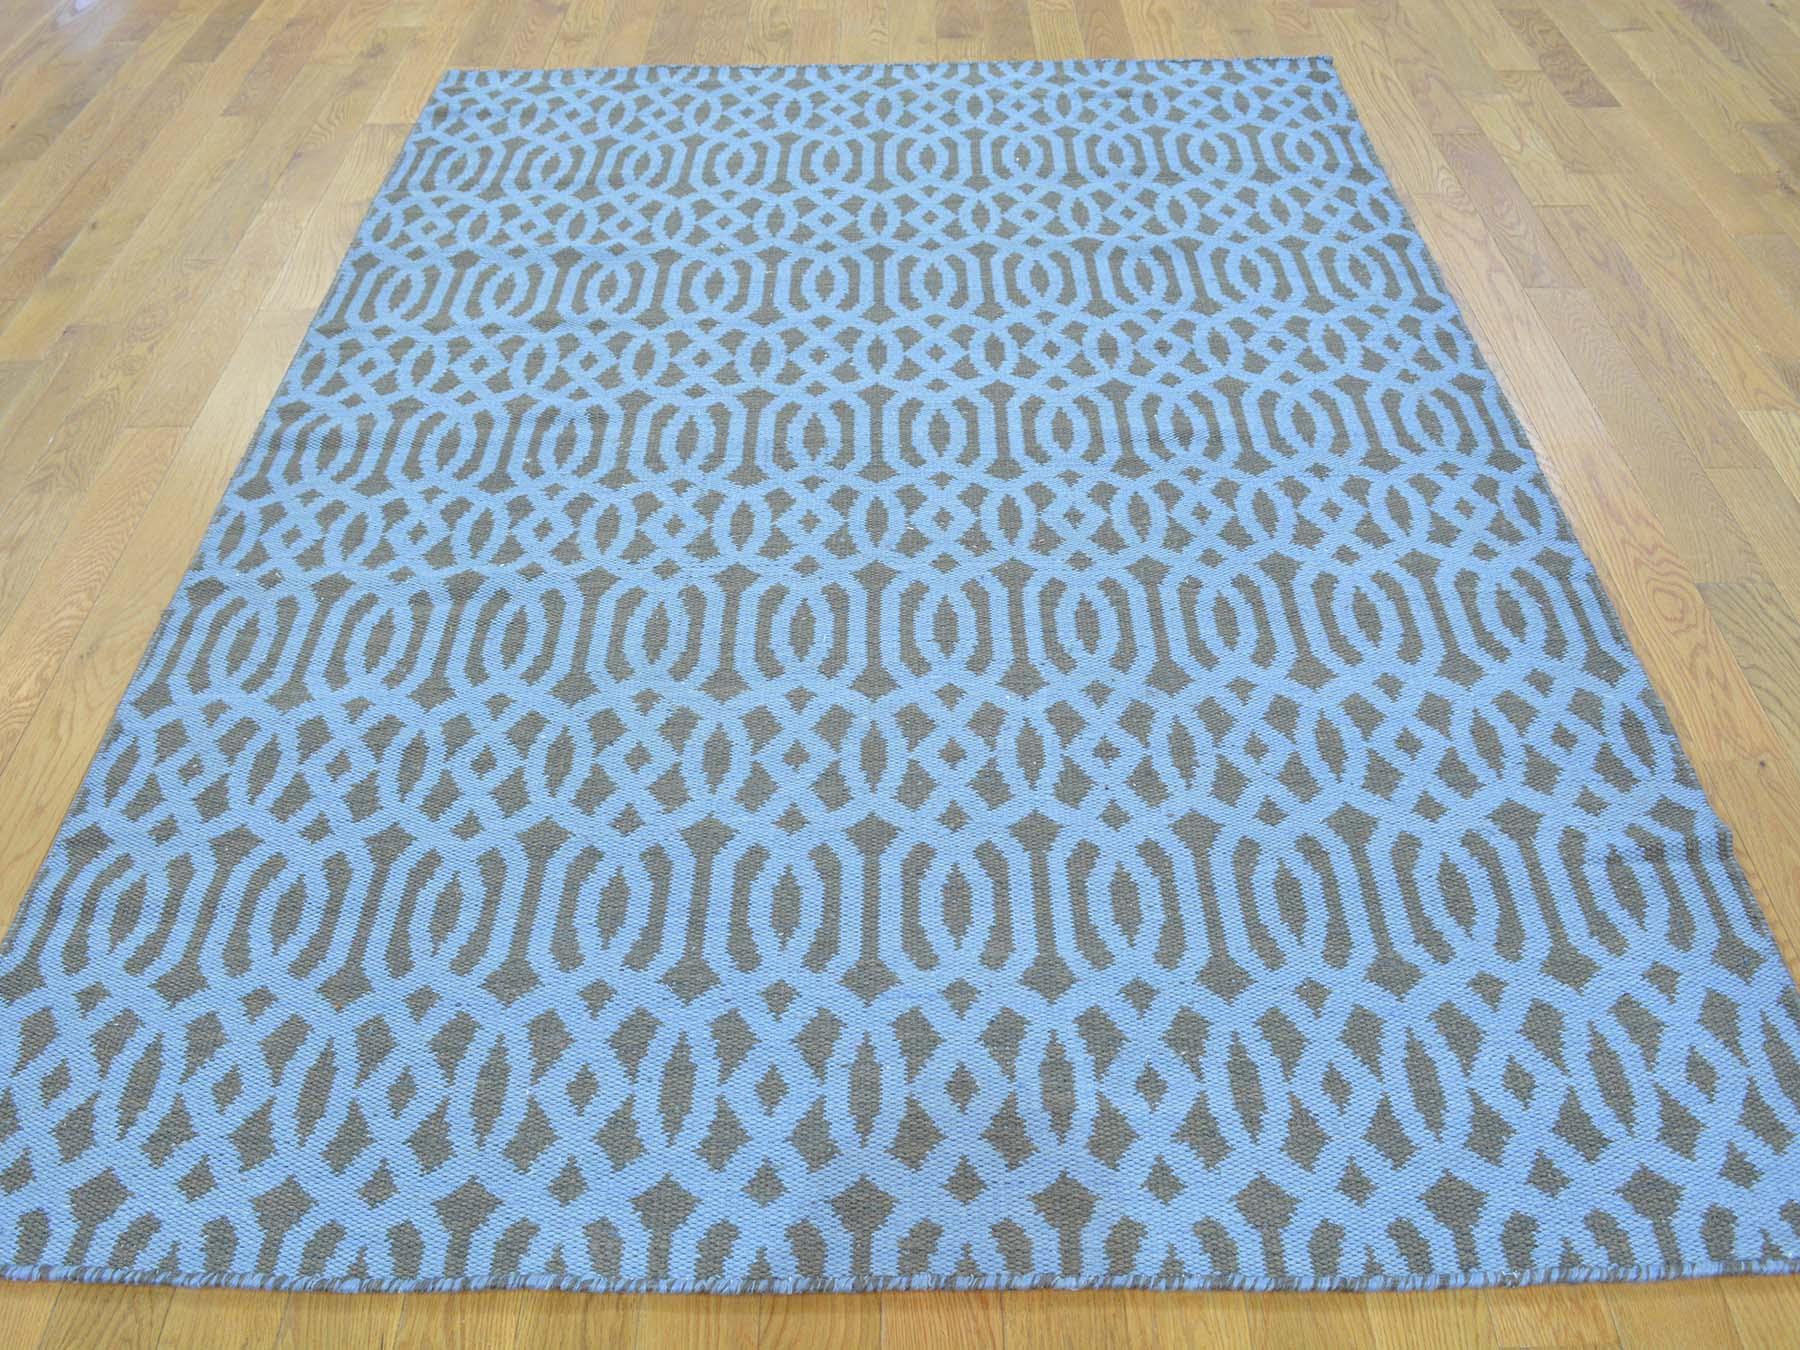 4-10 x7-2  Hand Woven Reversible Flat Weave Oriental Kilim Rug